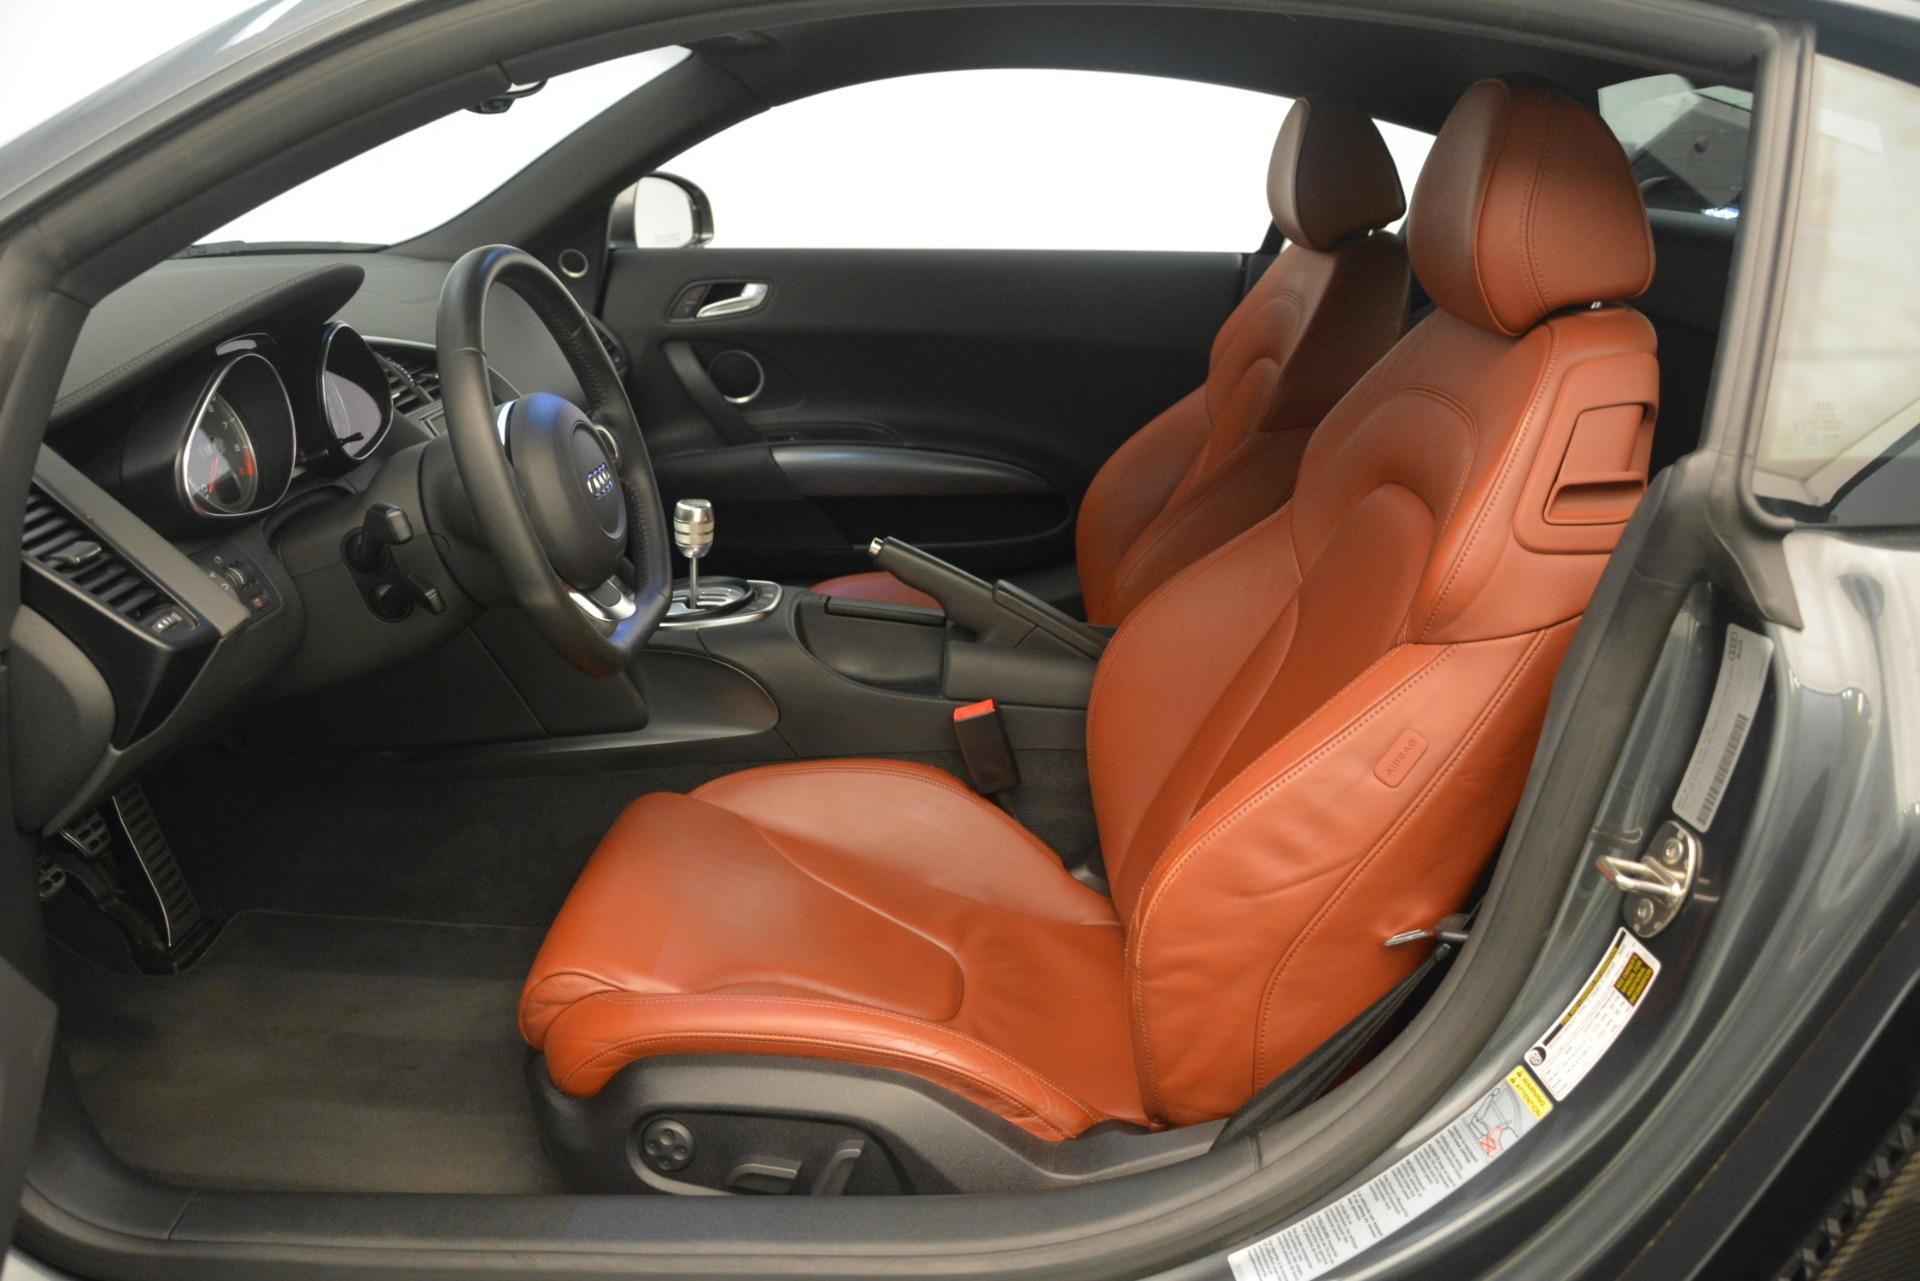 Used 2009 Audi R8 quattro For Sale In Greenwich, CT 3228_p14